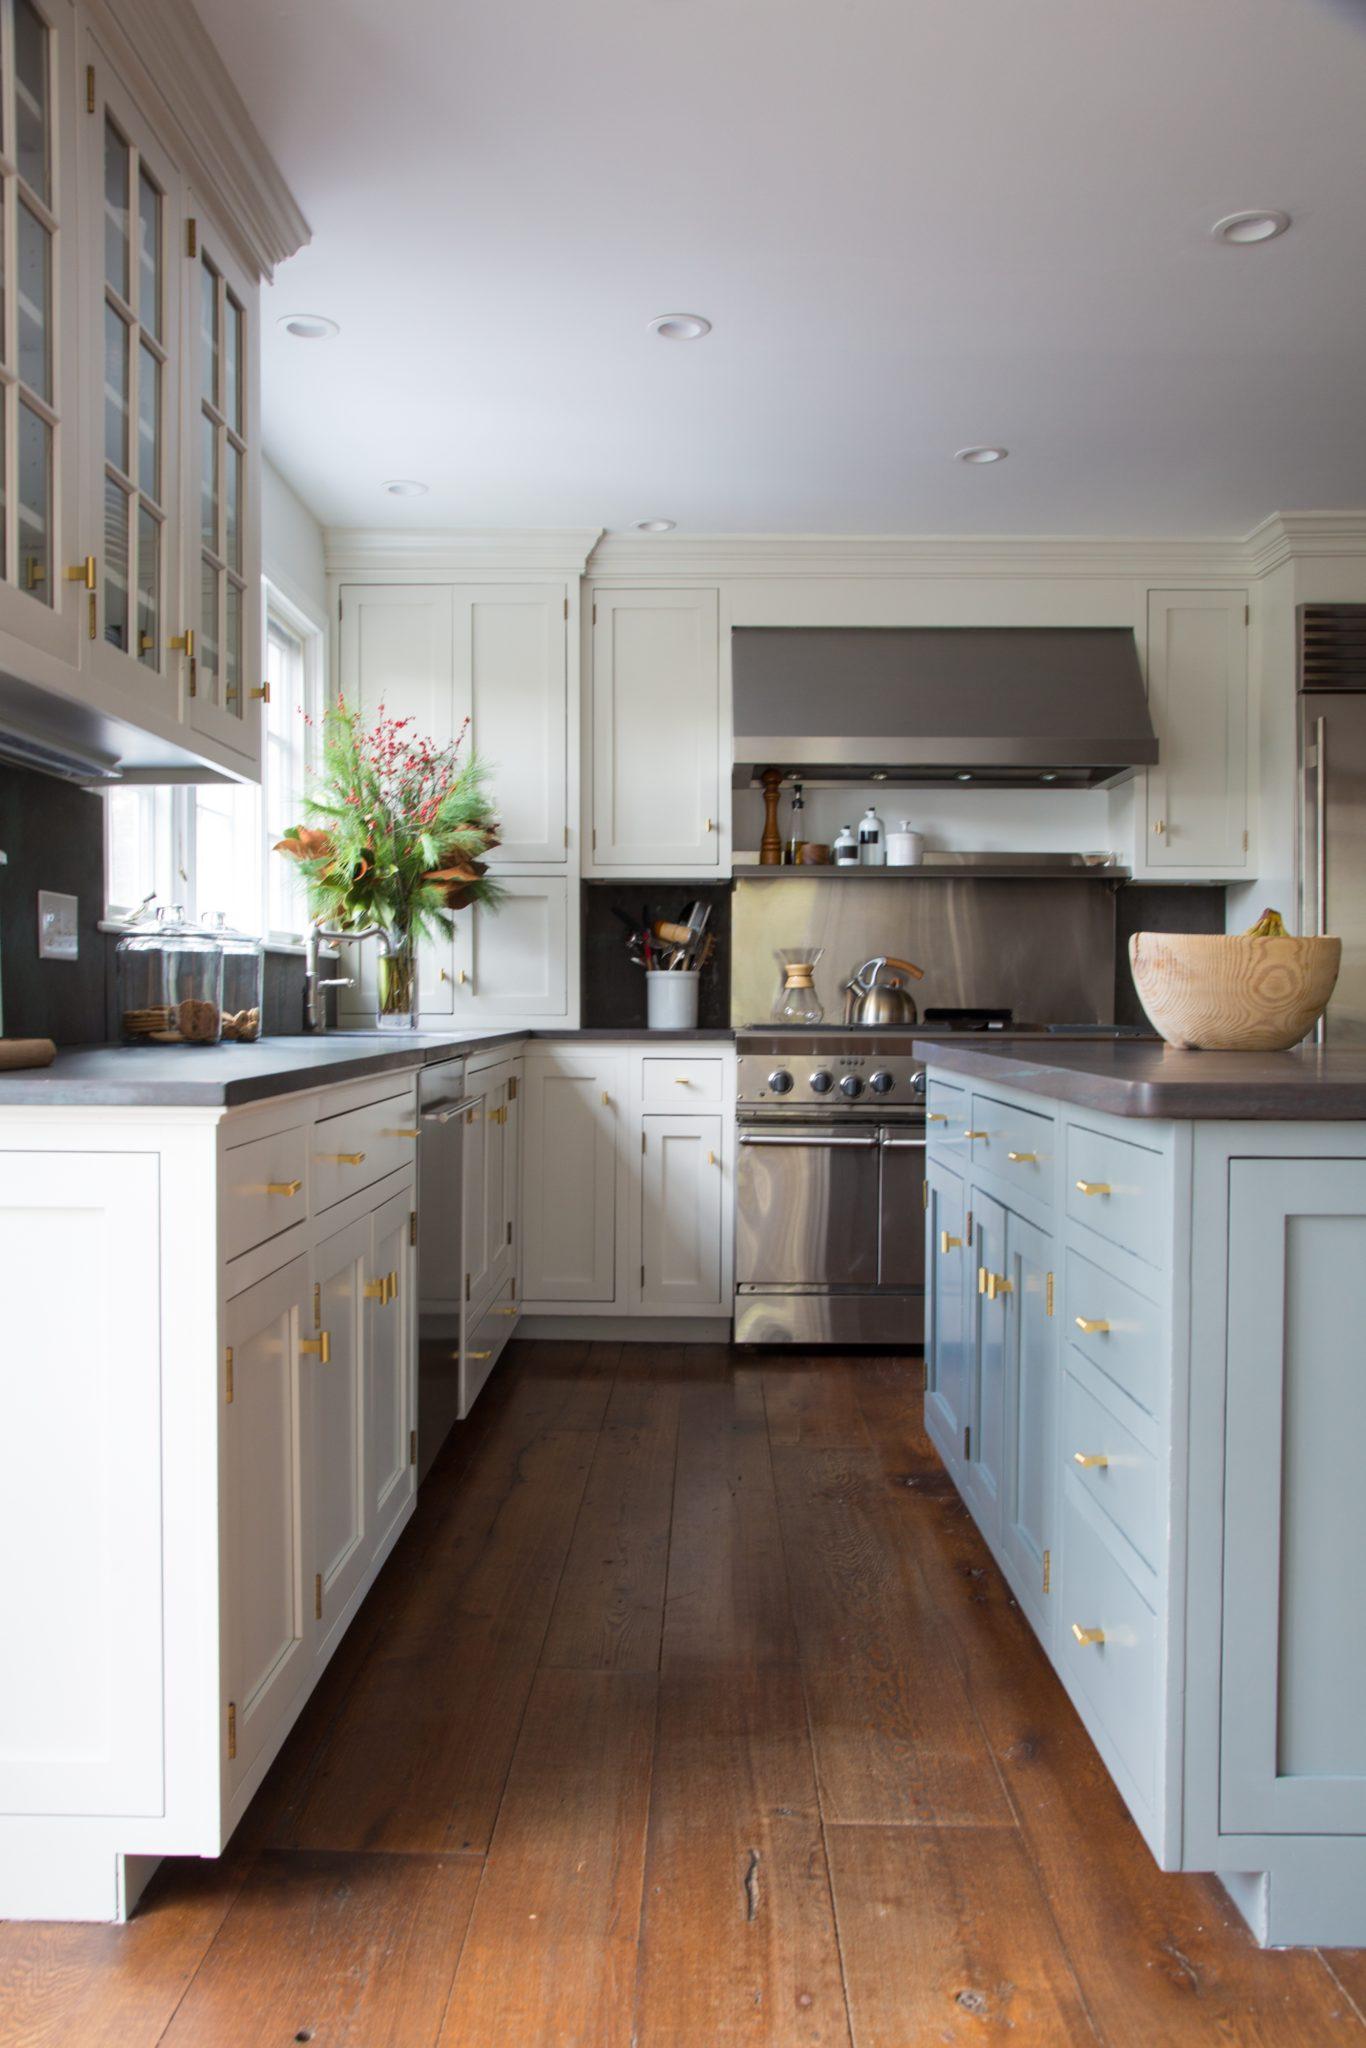 Modern farmhouse two-tone kitchen by Lauren A Balkan Designs